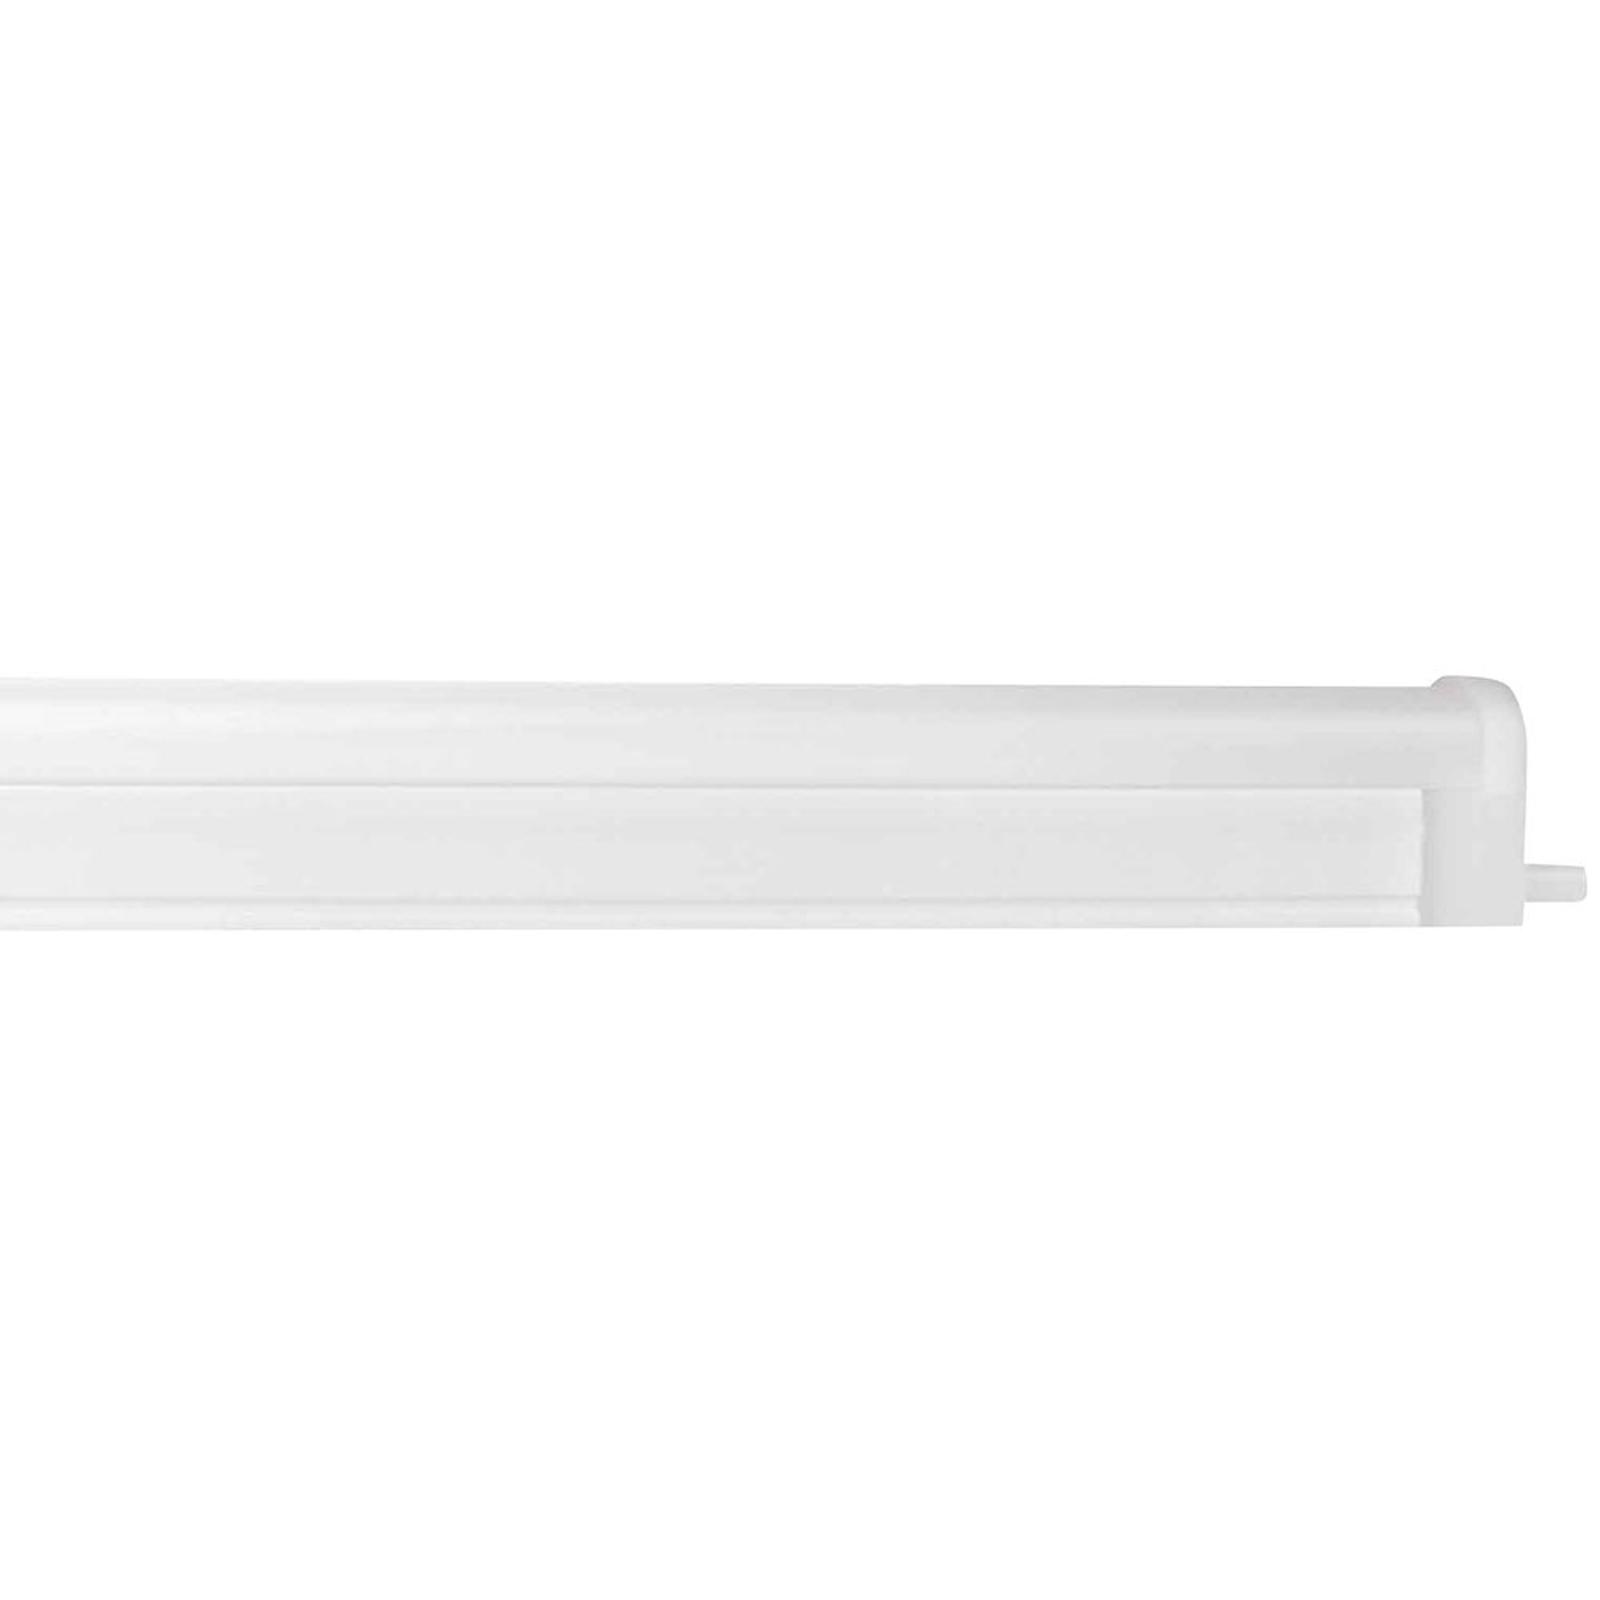 Megaman Pinolite LED-växtlampa, 28 cm, 4 W